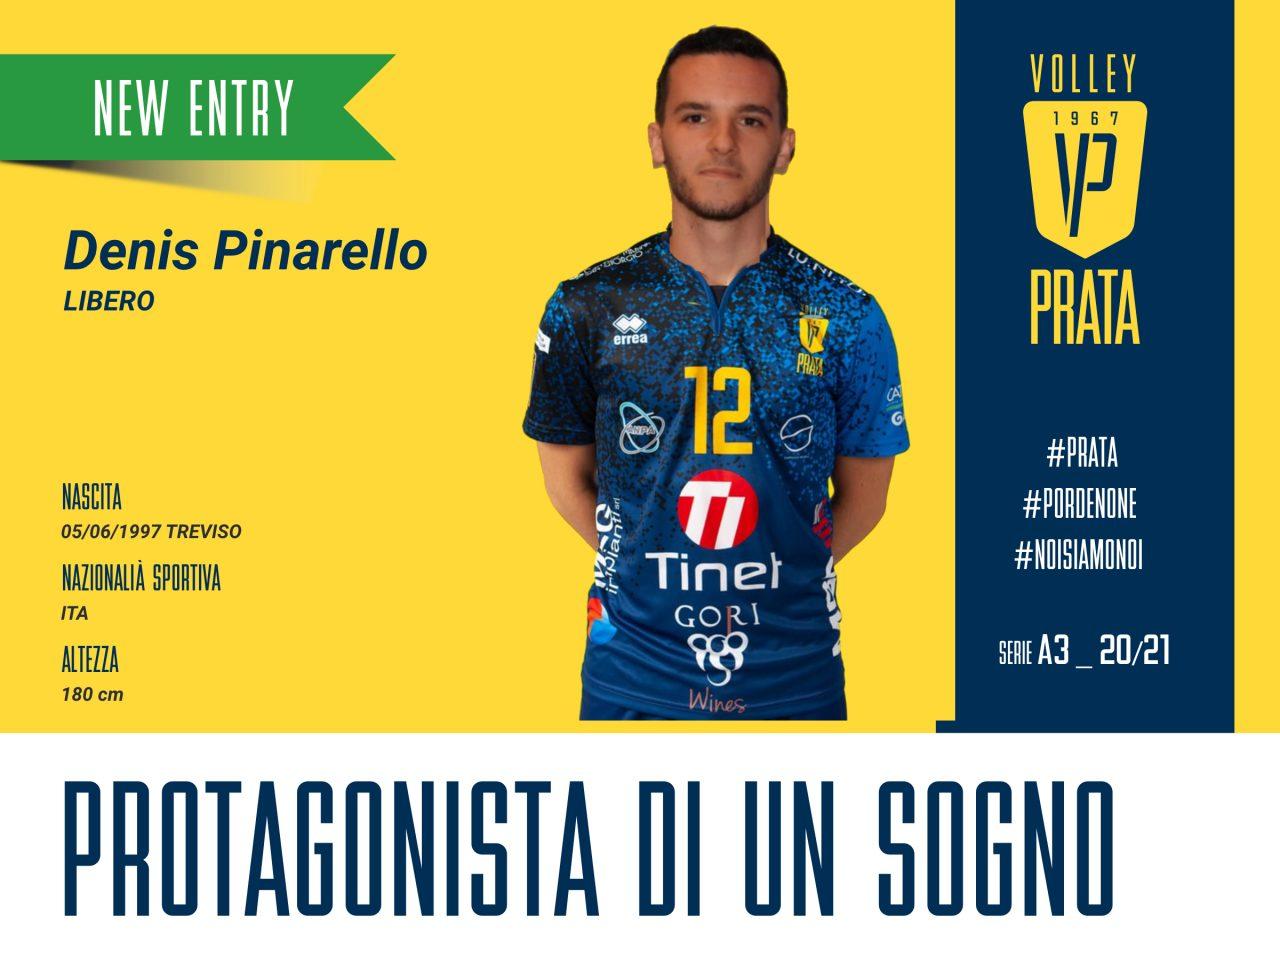 Annuncio-Pinarello-1280x960.jpg